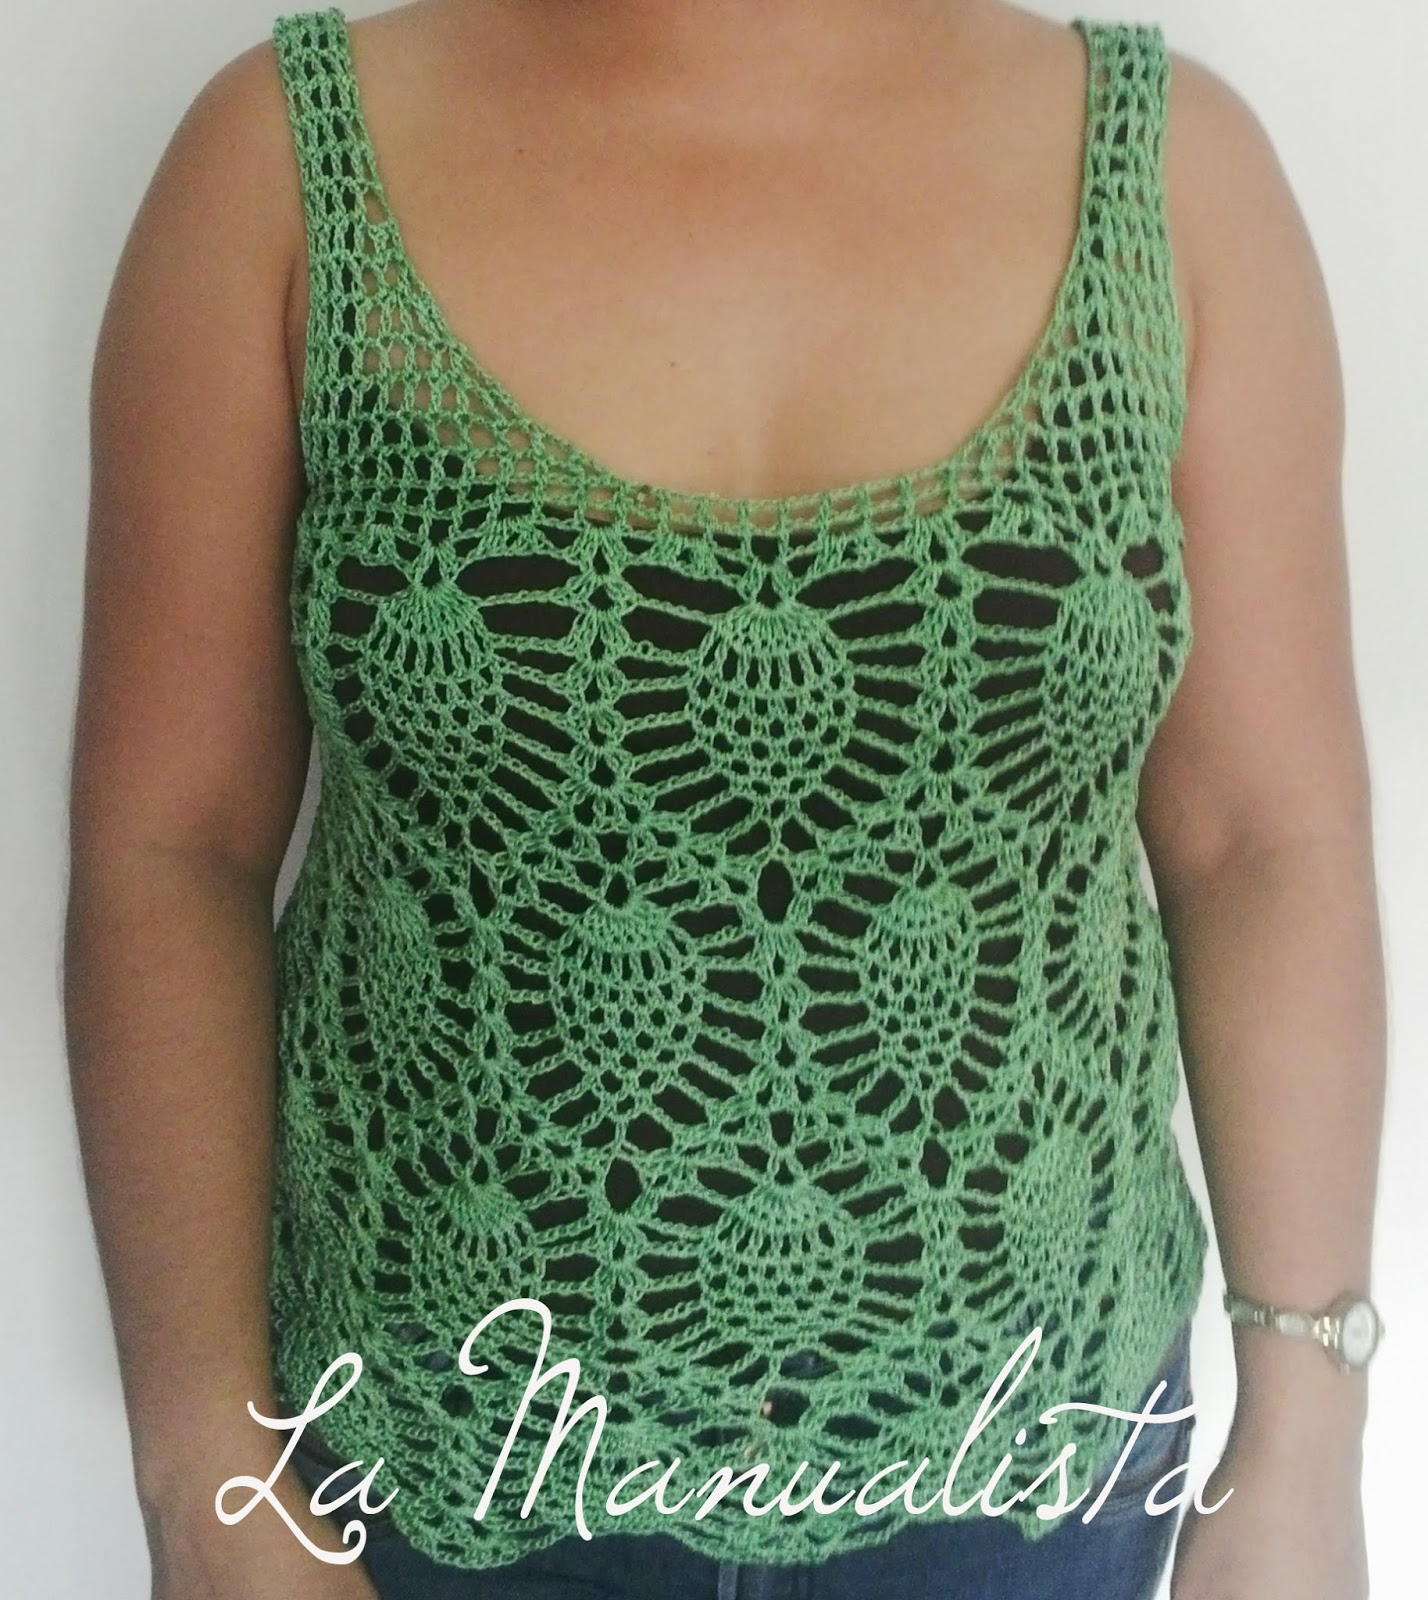 La manualista blusa crochet punto pi as o pi itas - Esquema punto estrella crochet ...